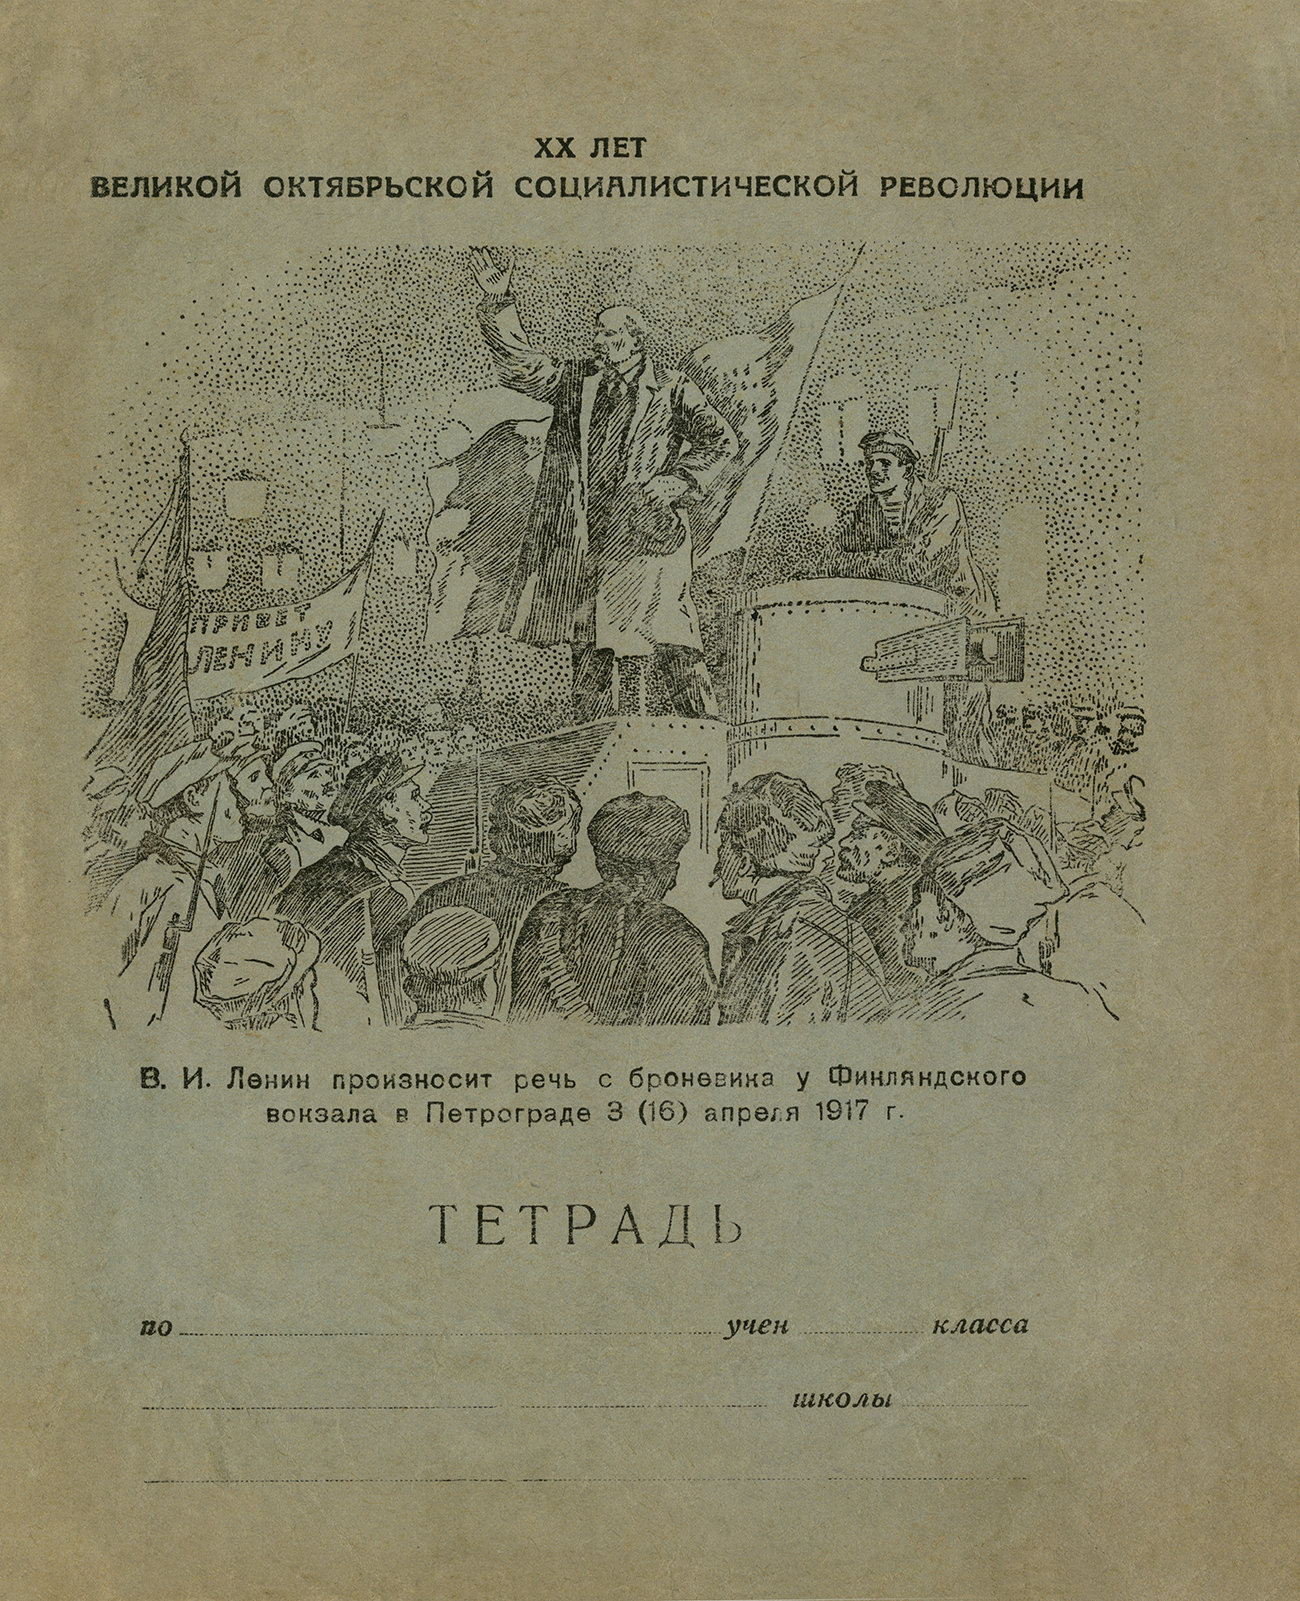 Тетрадь Ленин на броневике, 1937, 170х210